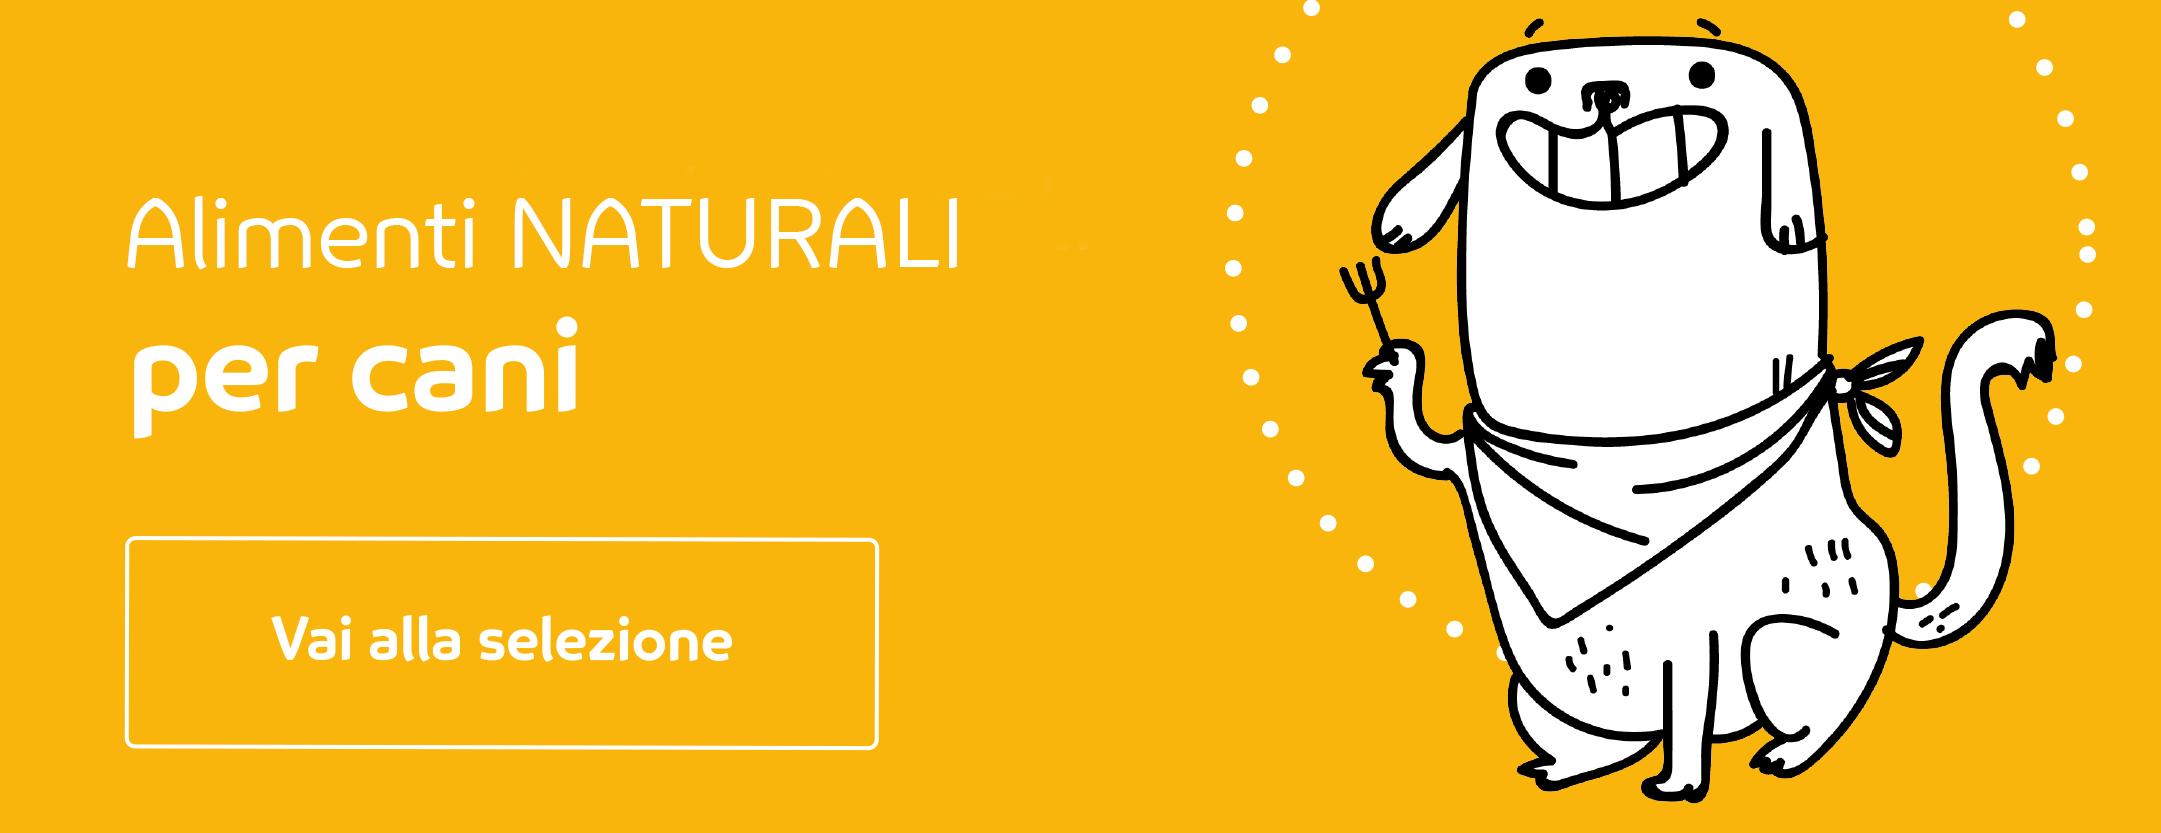 naturali-cane.png